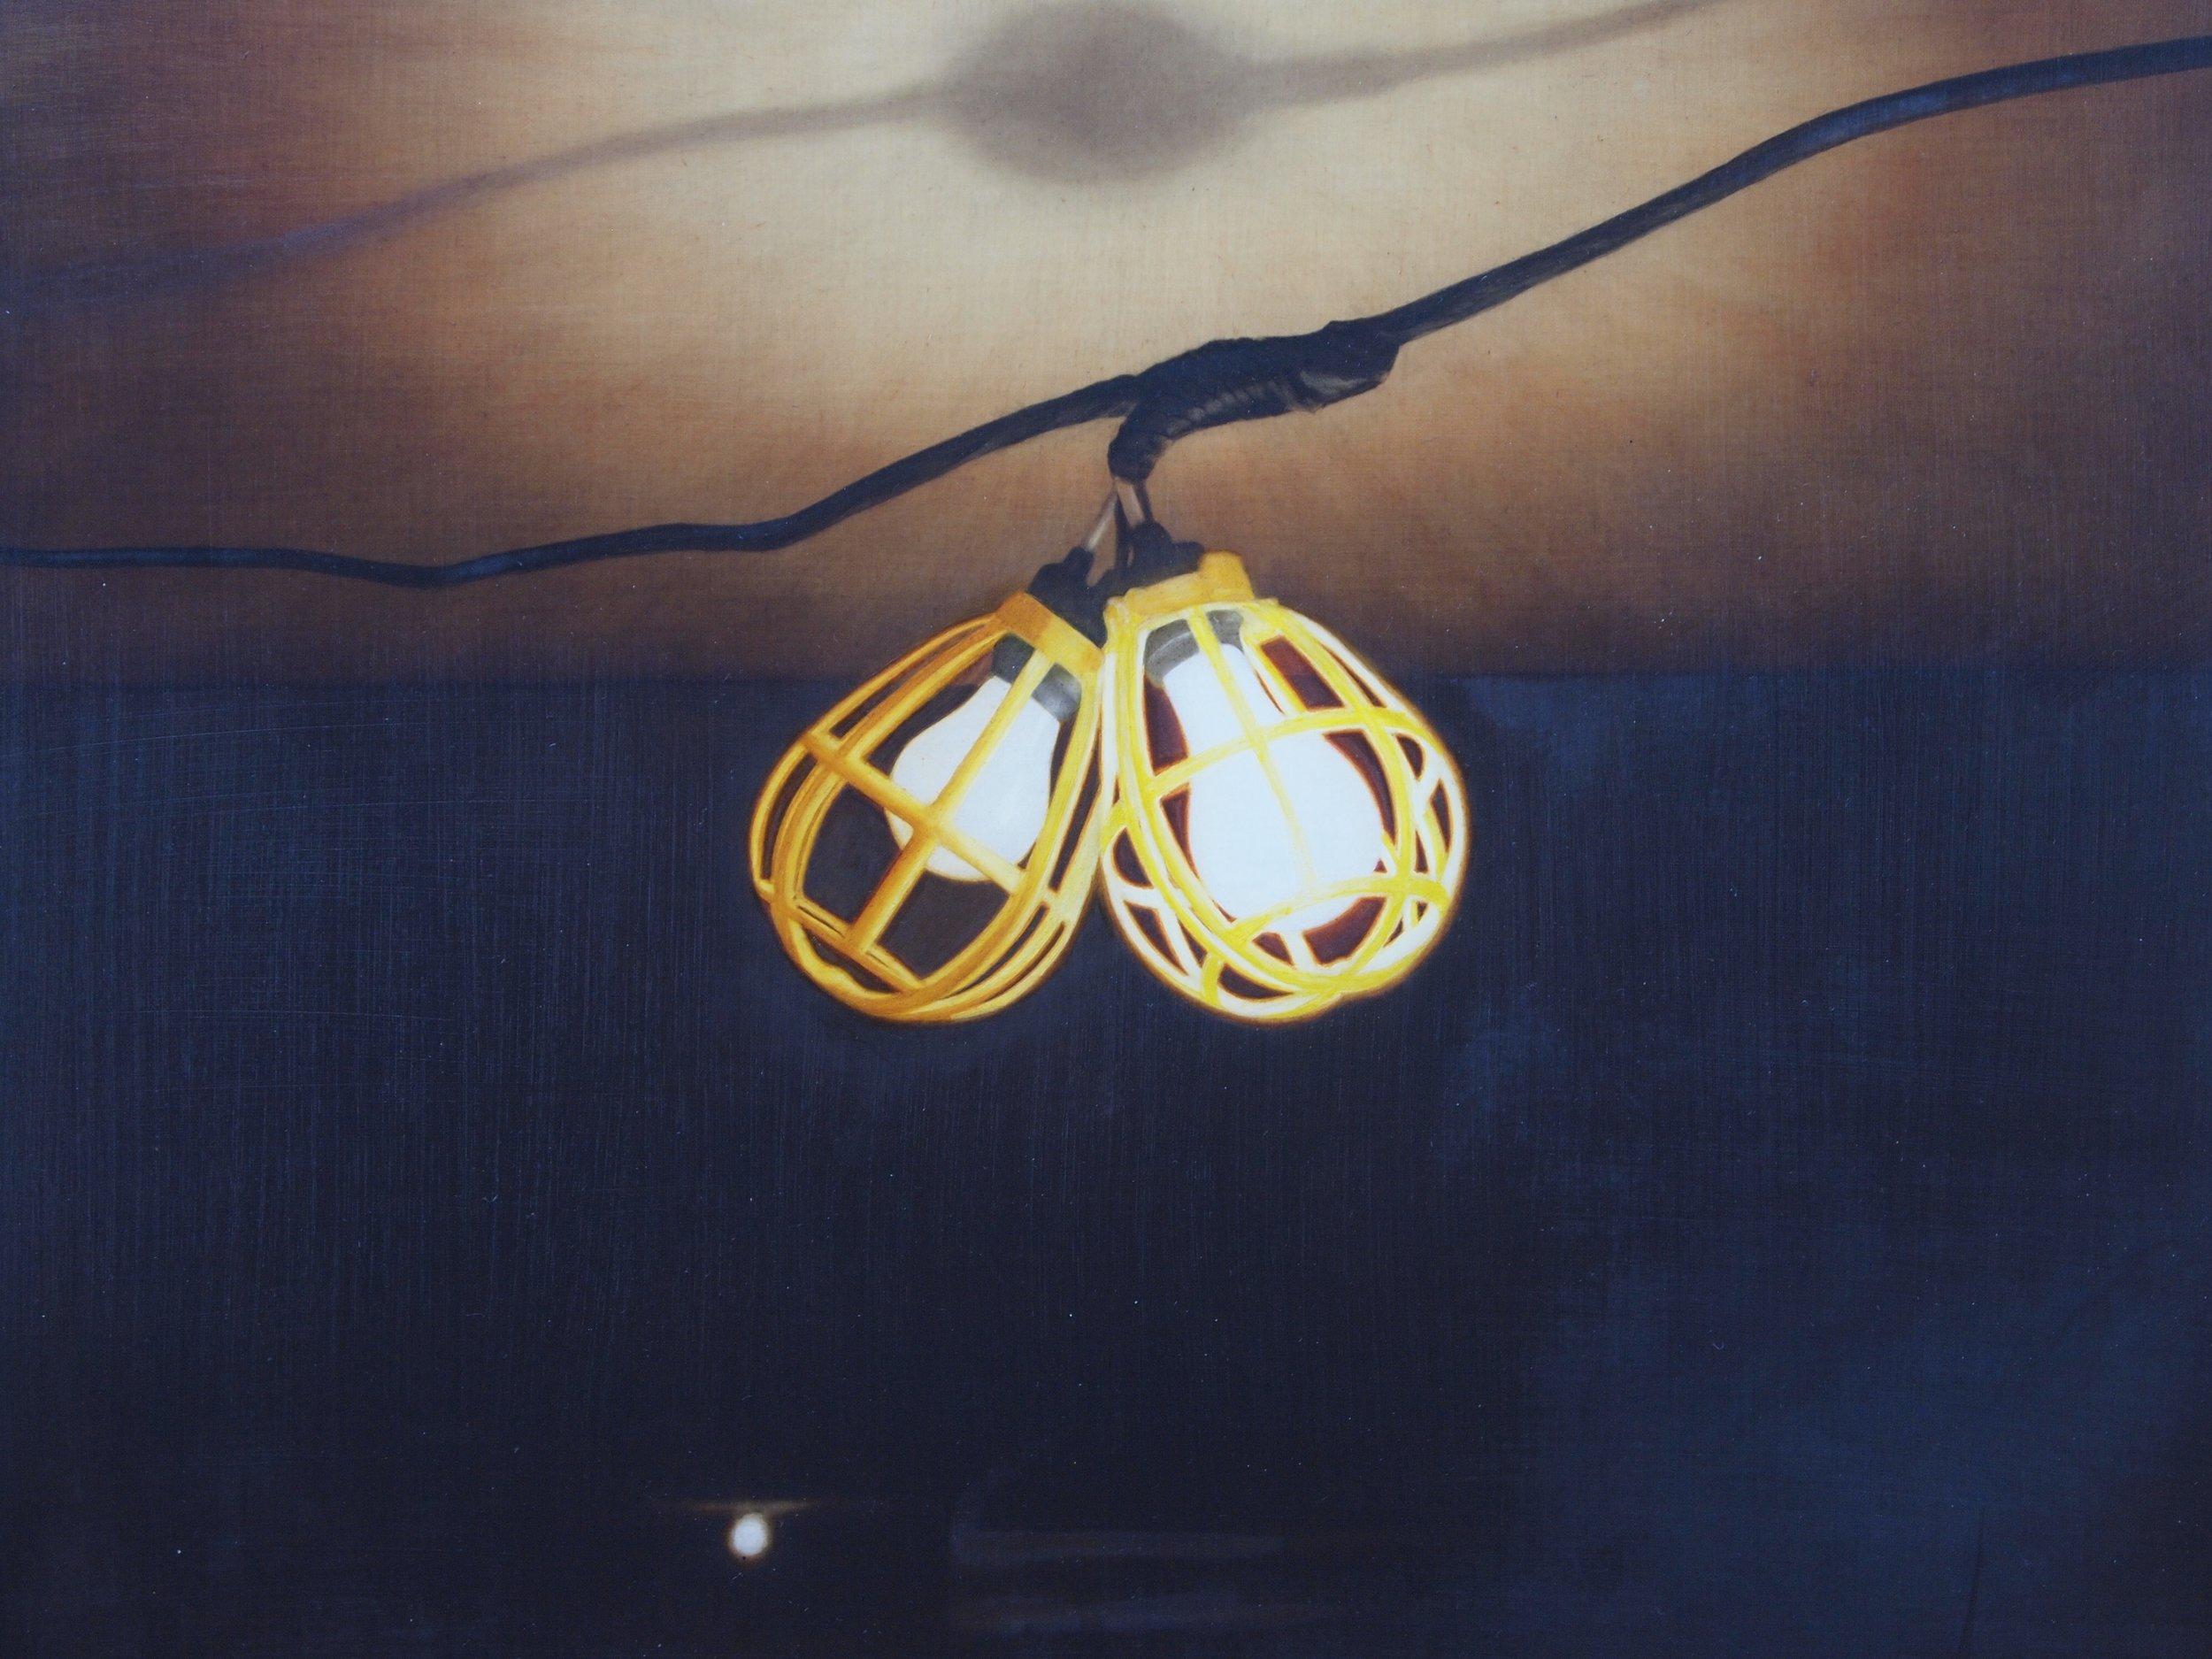 Worklight, 2012, 16x20, o/l